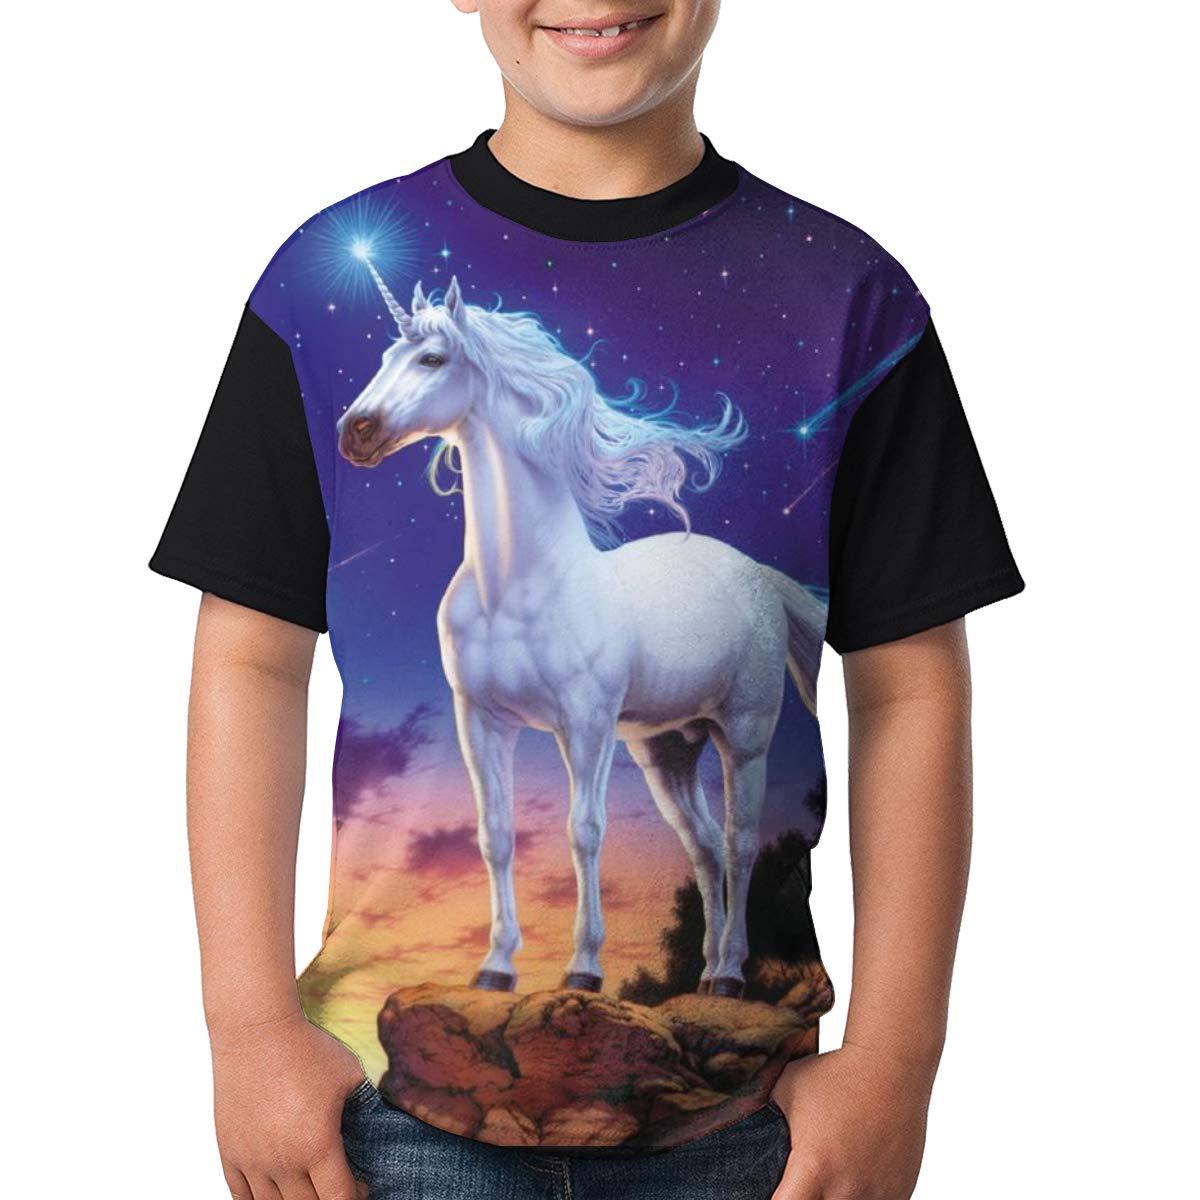 Toomny Boys Unicorn//Galaxy Short Sleeve T-Shirt